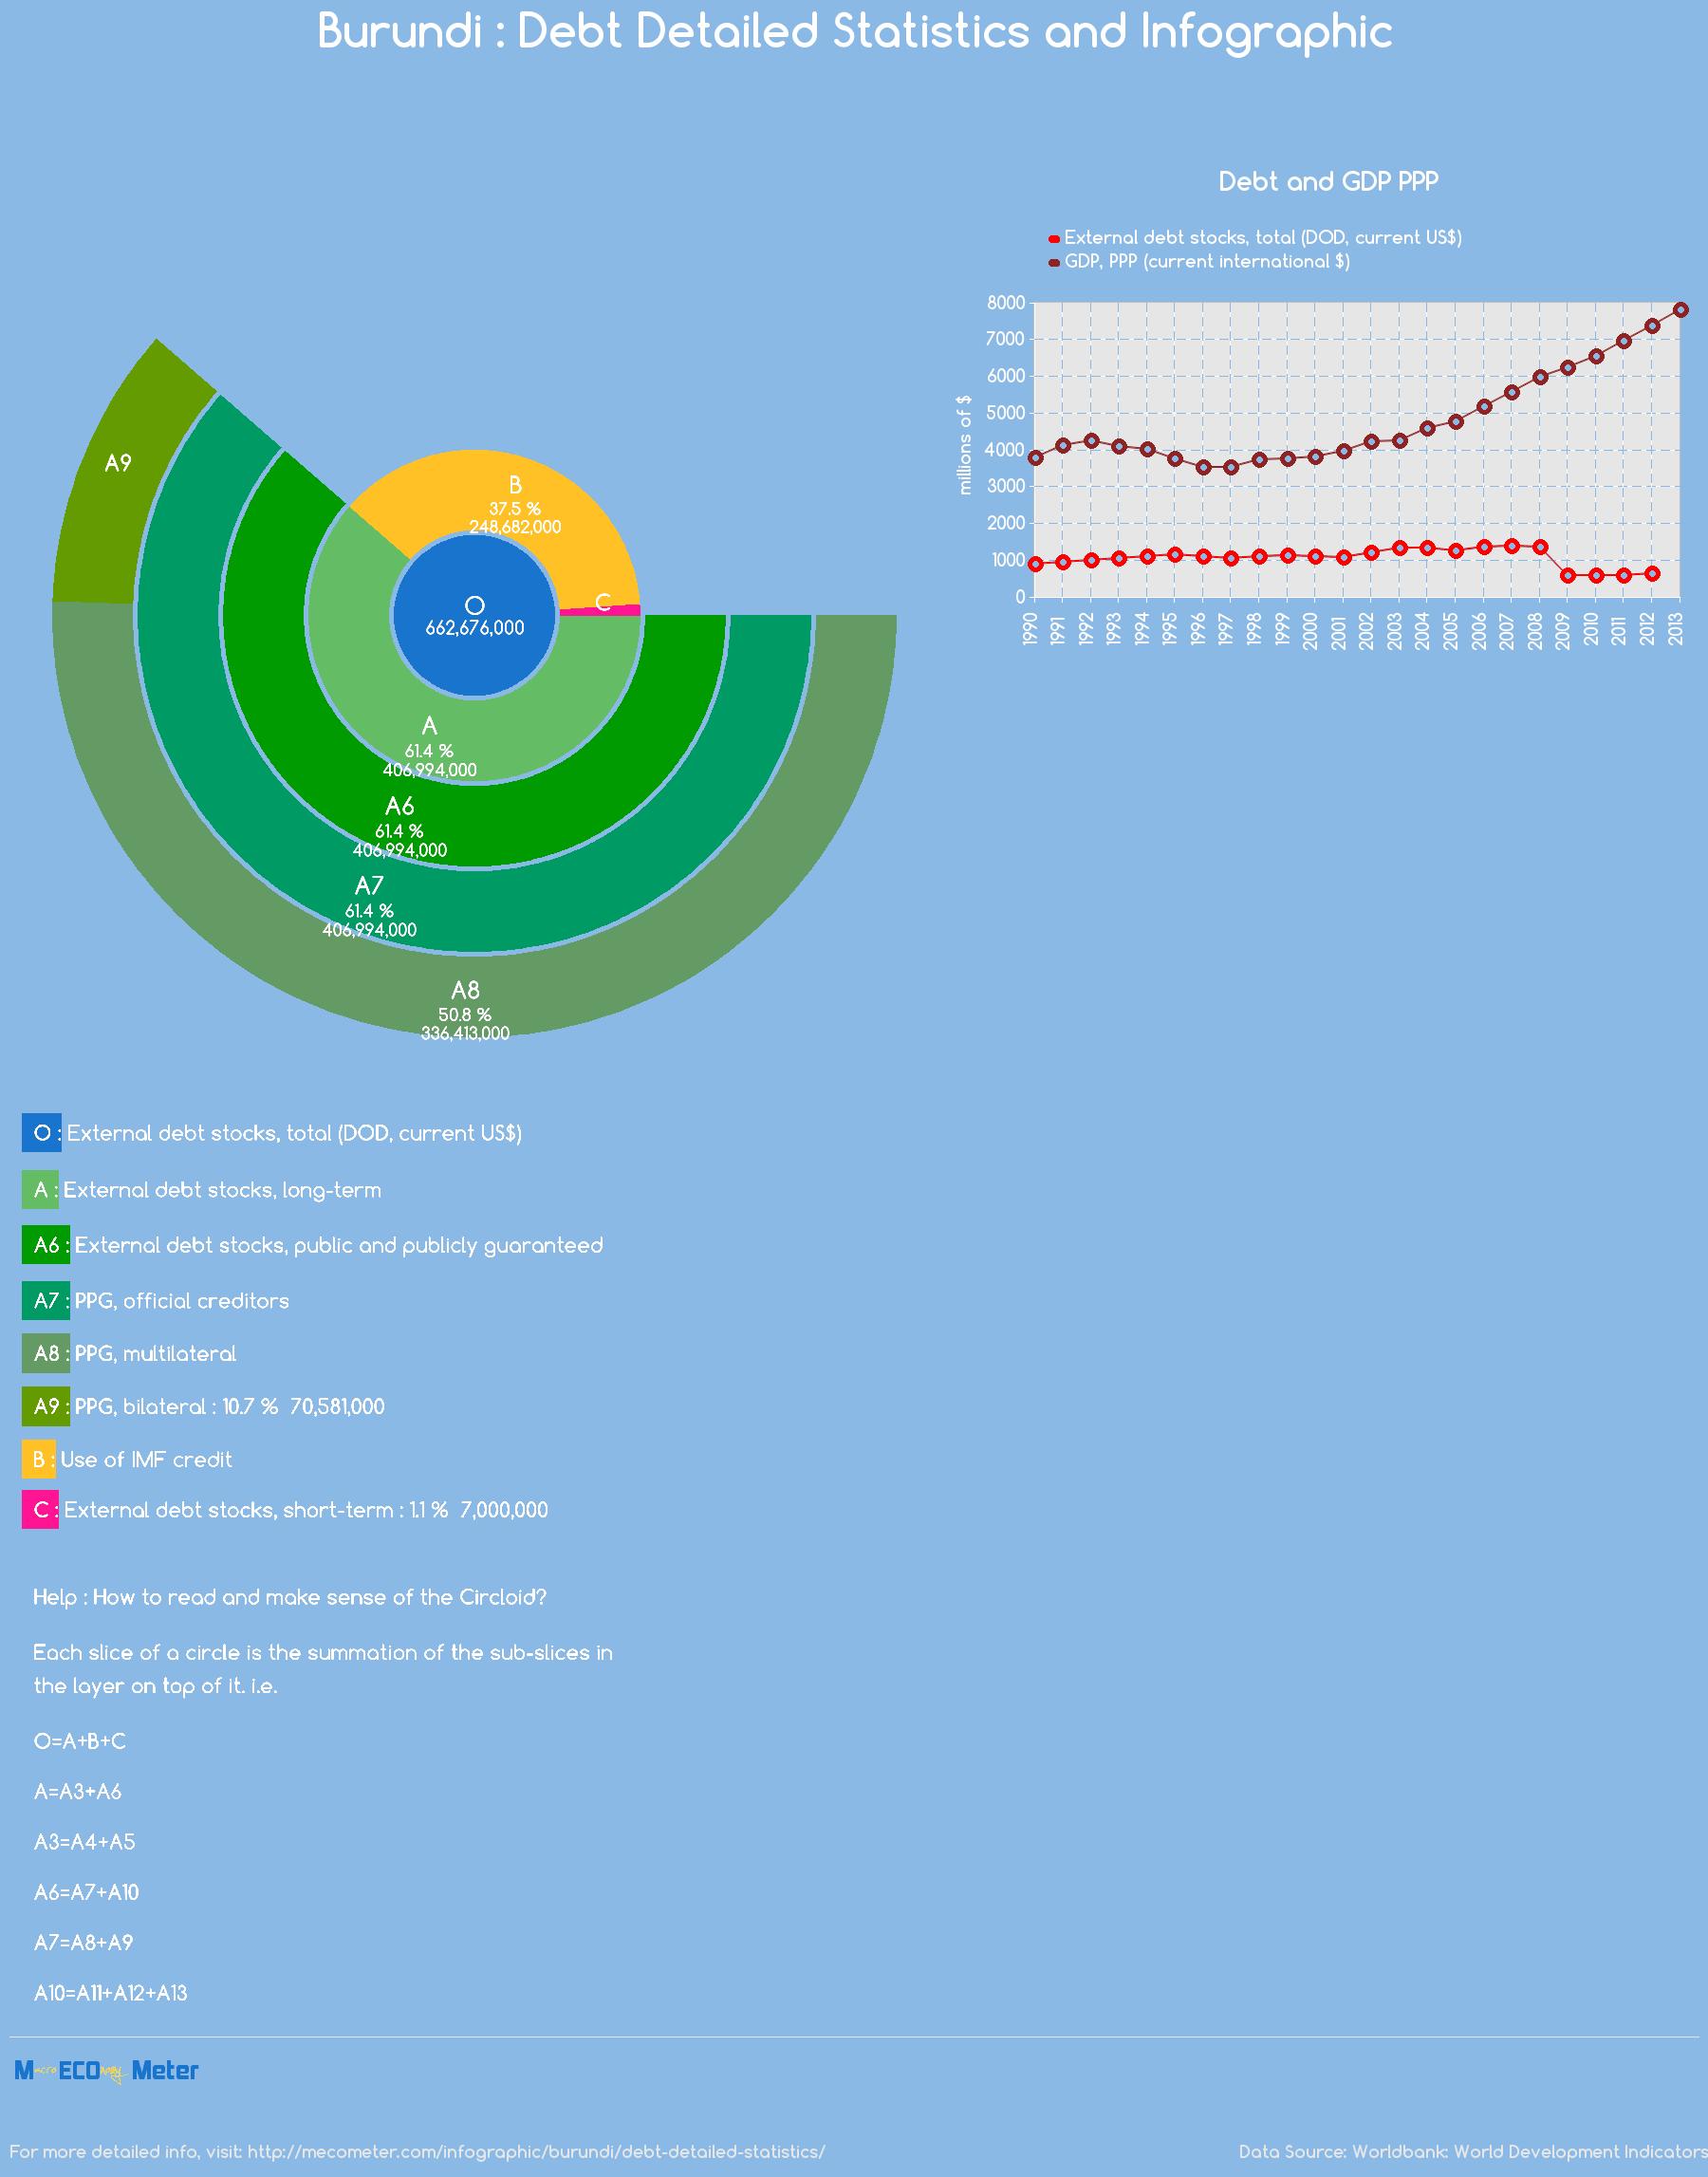 Burundi : Debt Detailed Statistics and Infographic